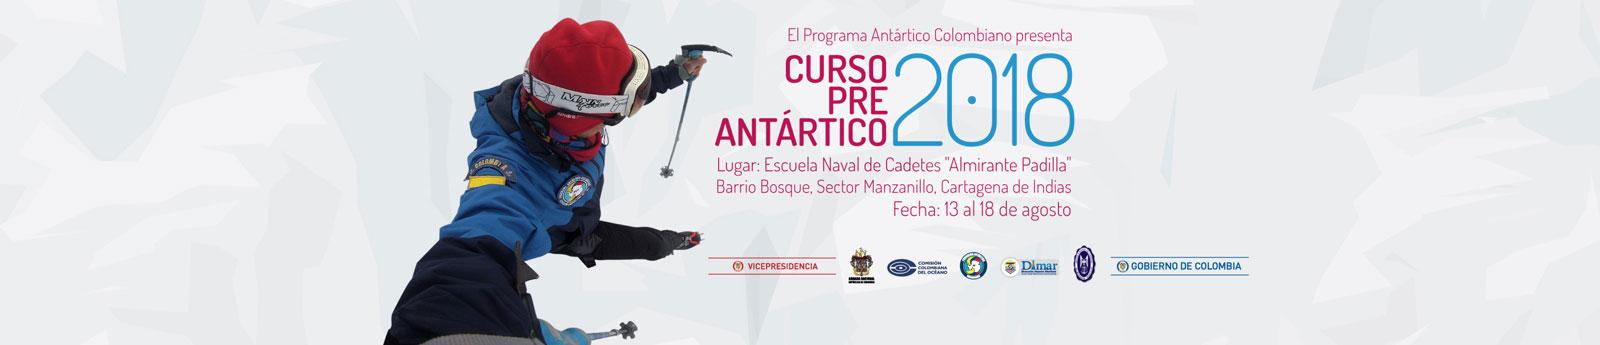 Curso pre antártico 2018